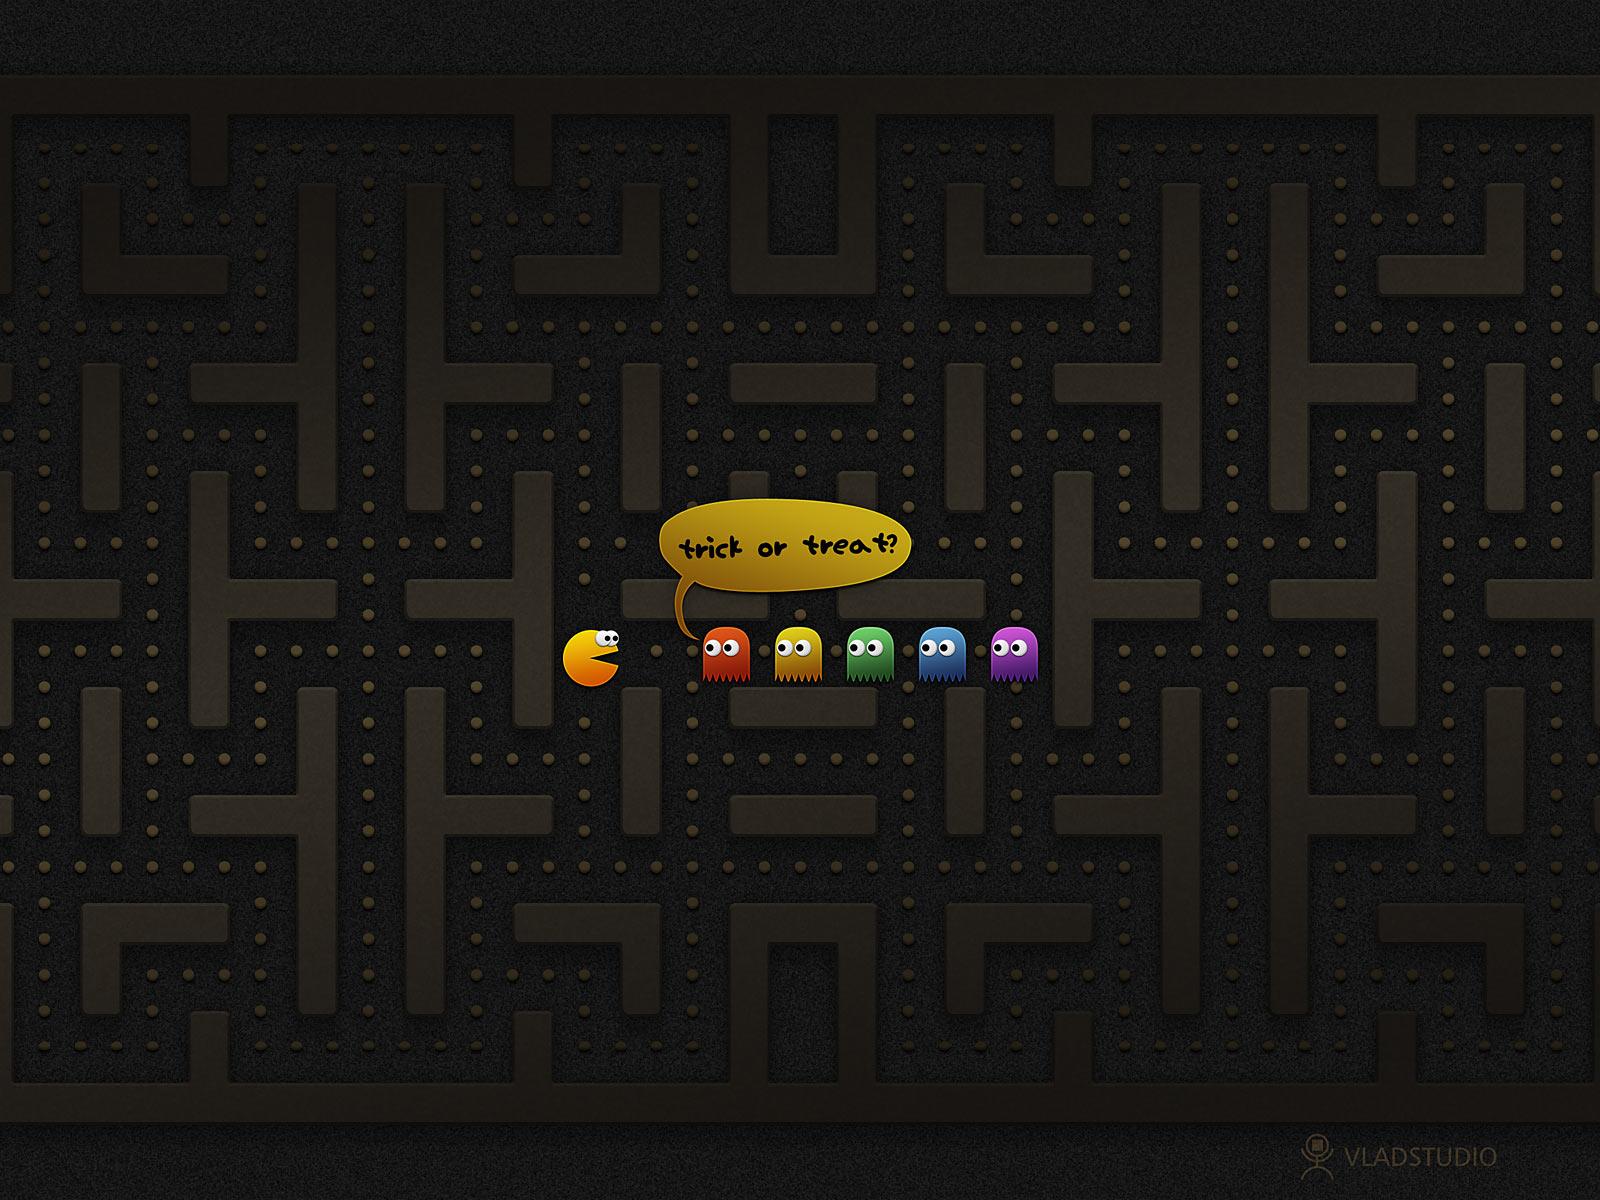 Trick or Treat? PacMan by vladstudio